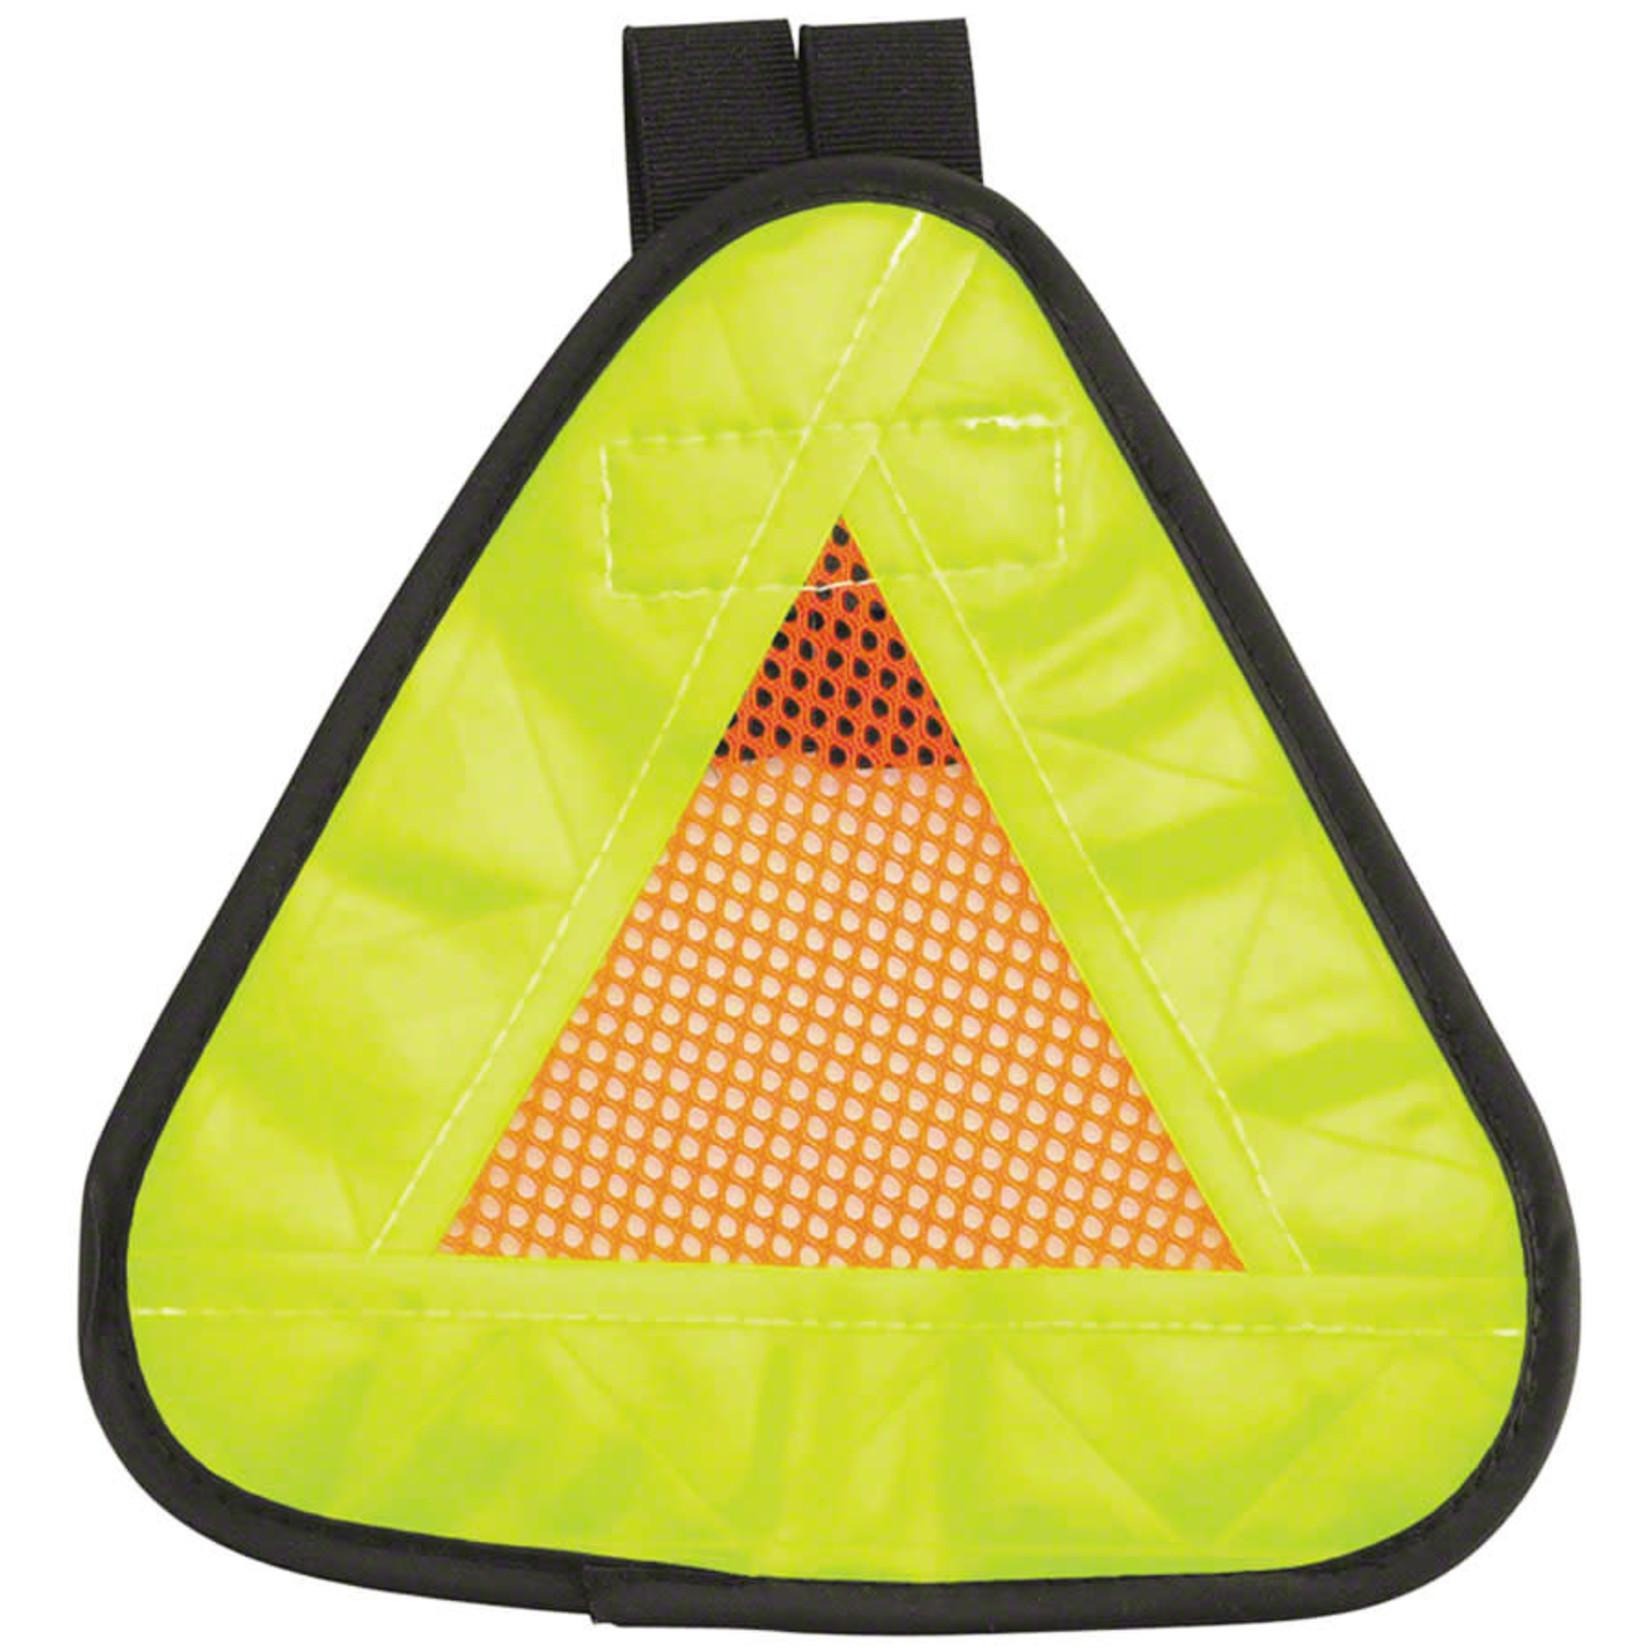 "Aardvark Reflective Triangle Yield Symbol 7x7"" with Velcro Strap"